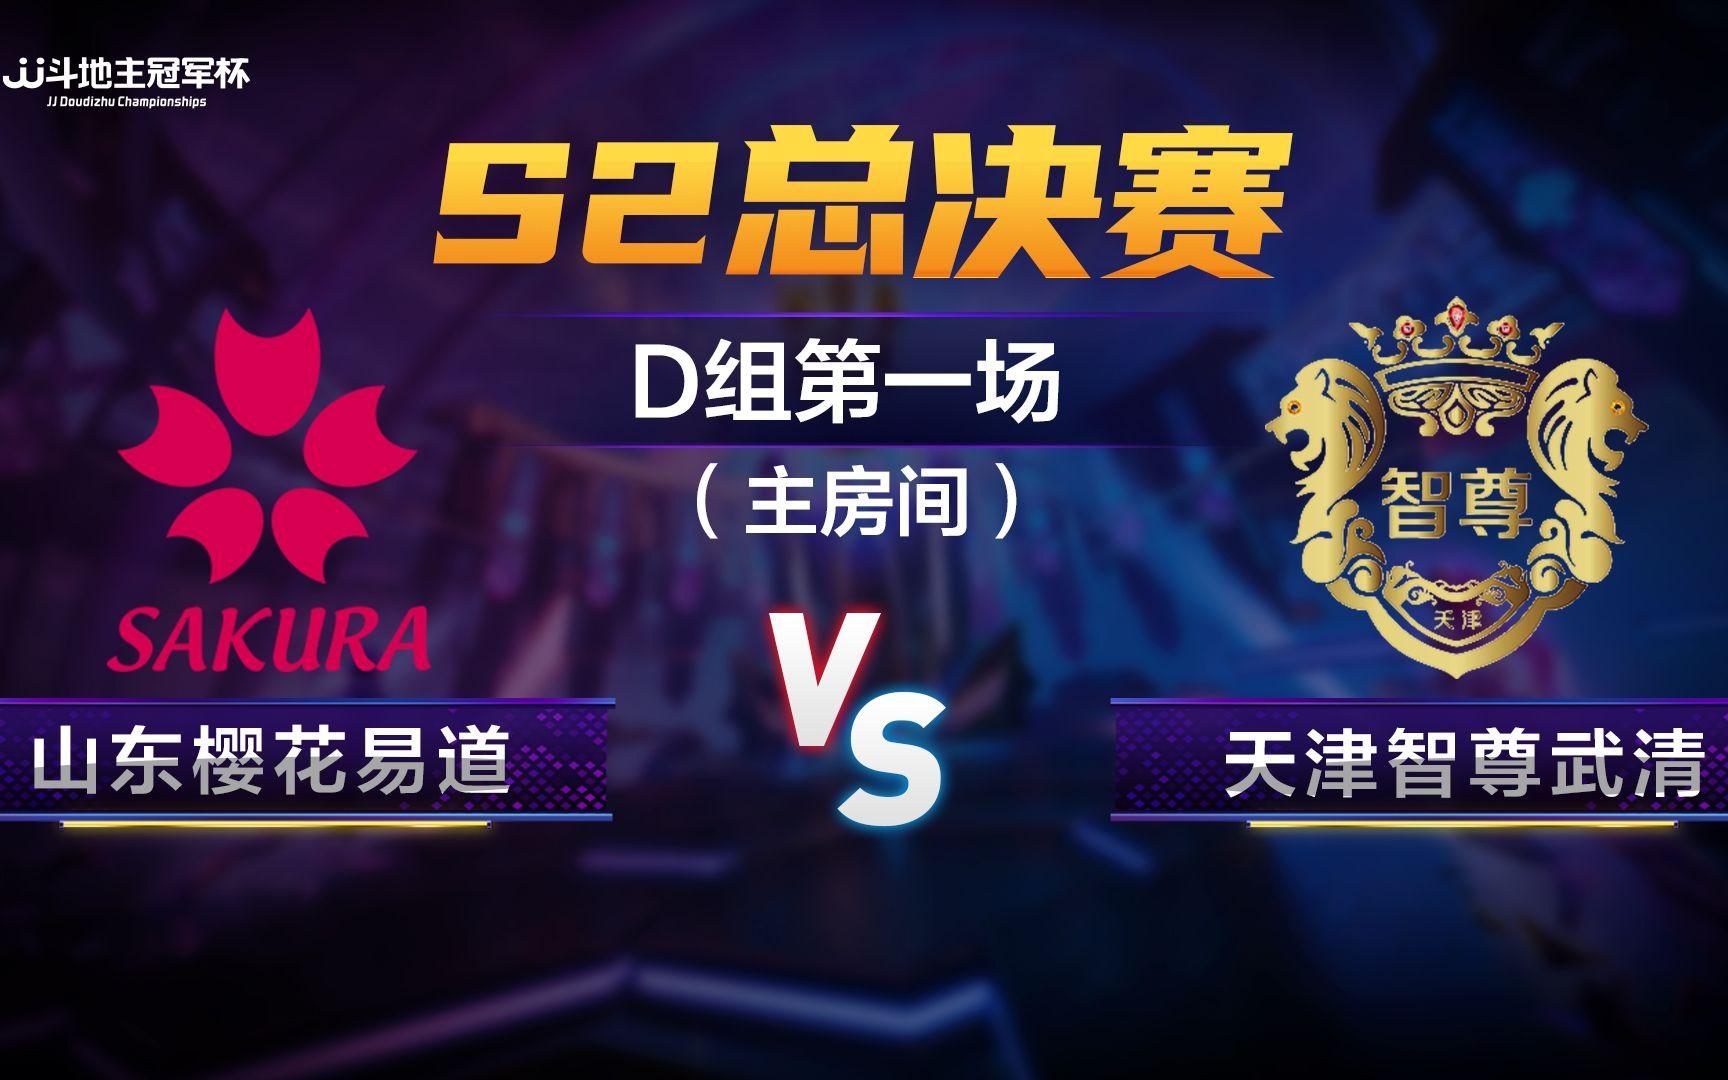 S2总决赛D组第一场12月12日:山东樱花易道 vs 天津智尊武清